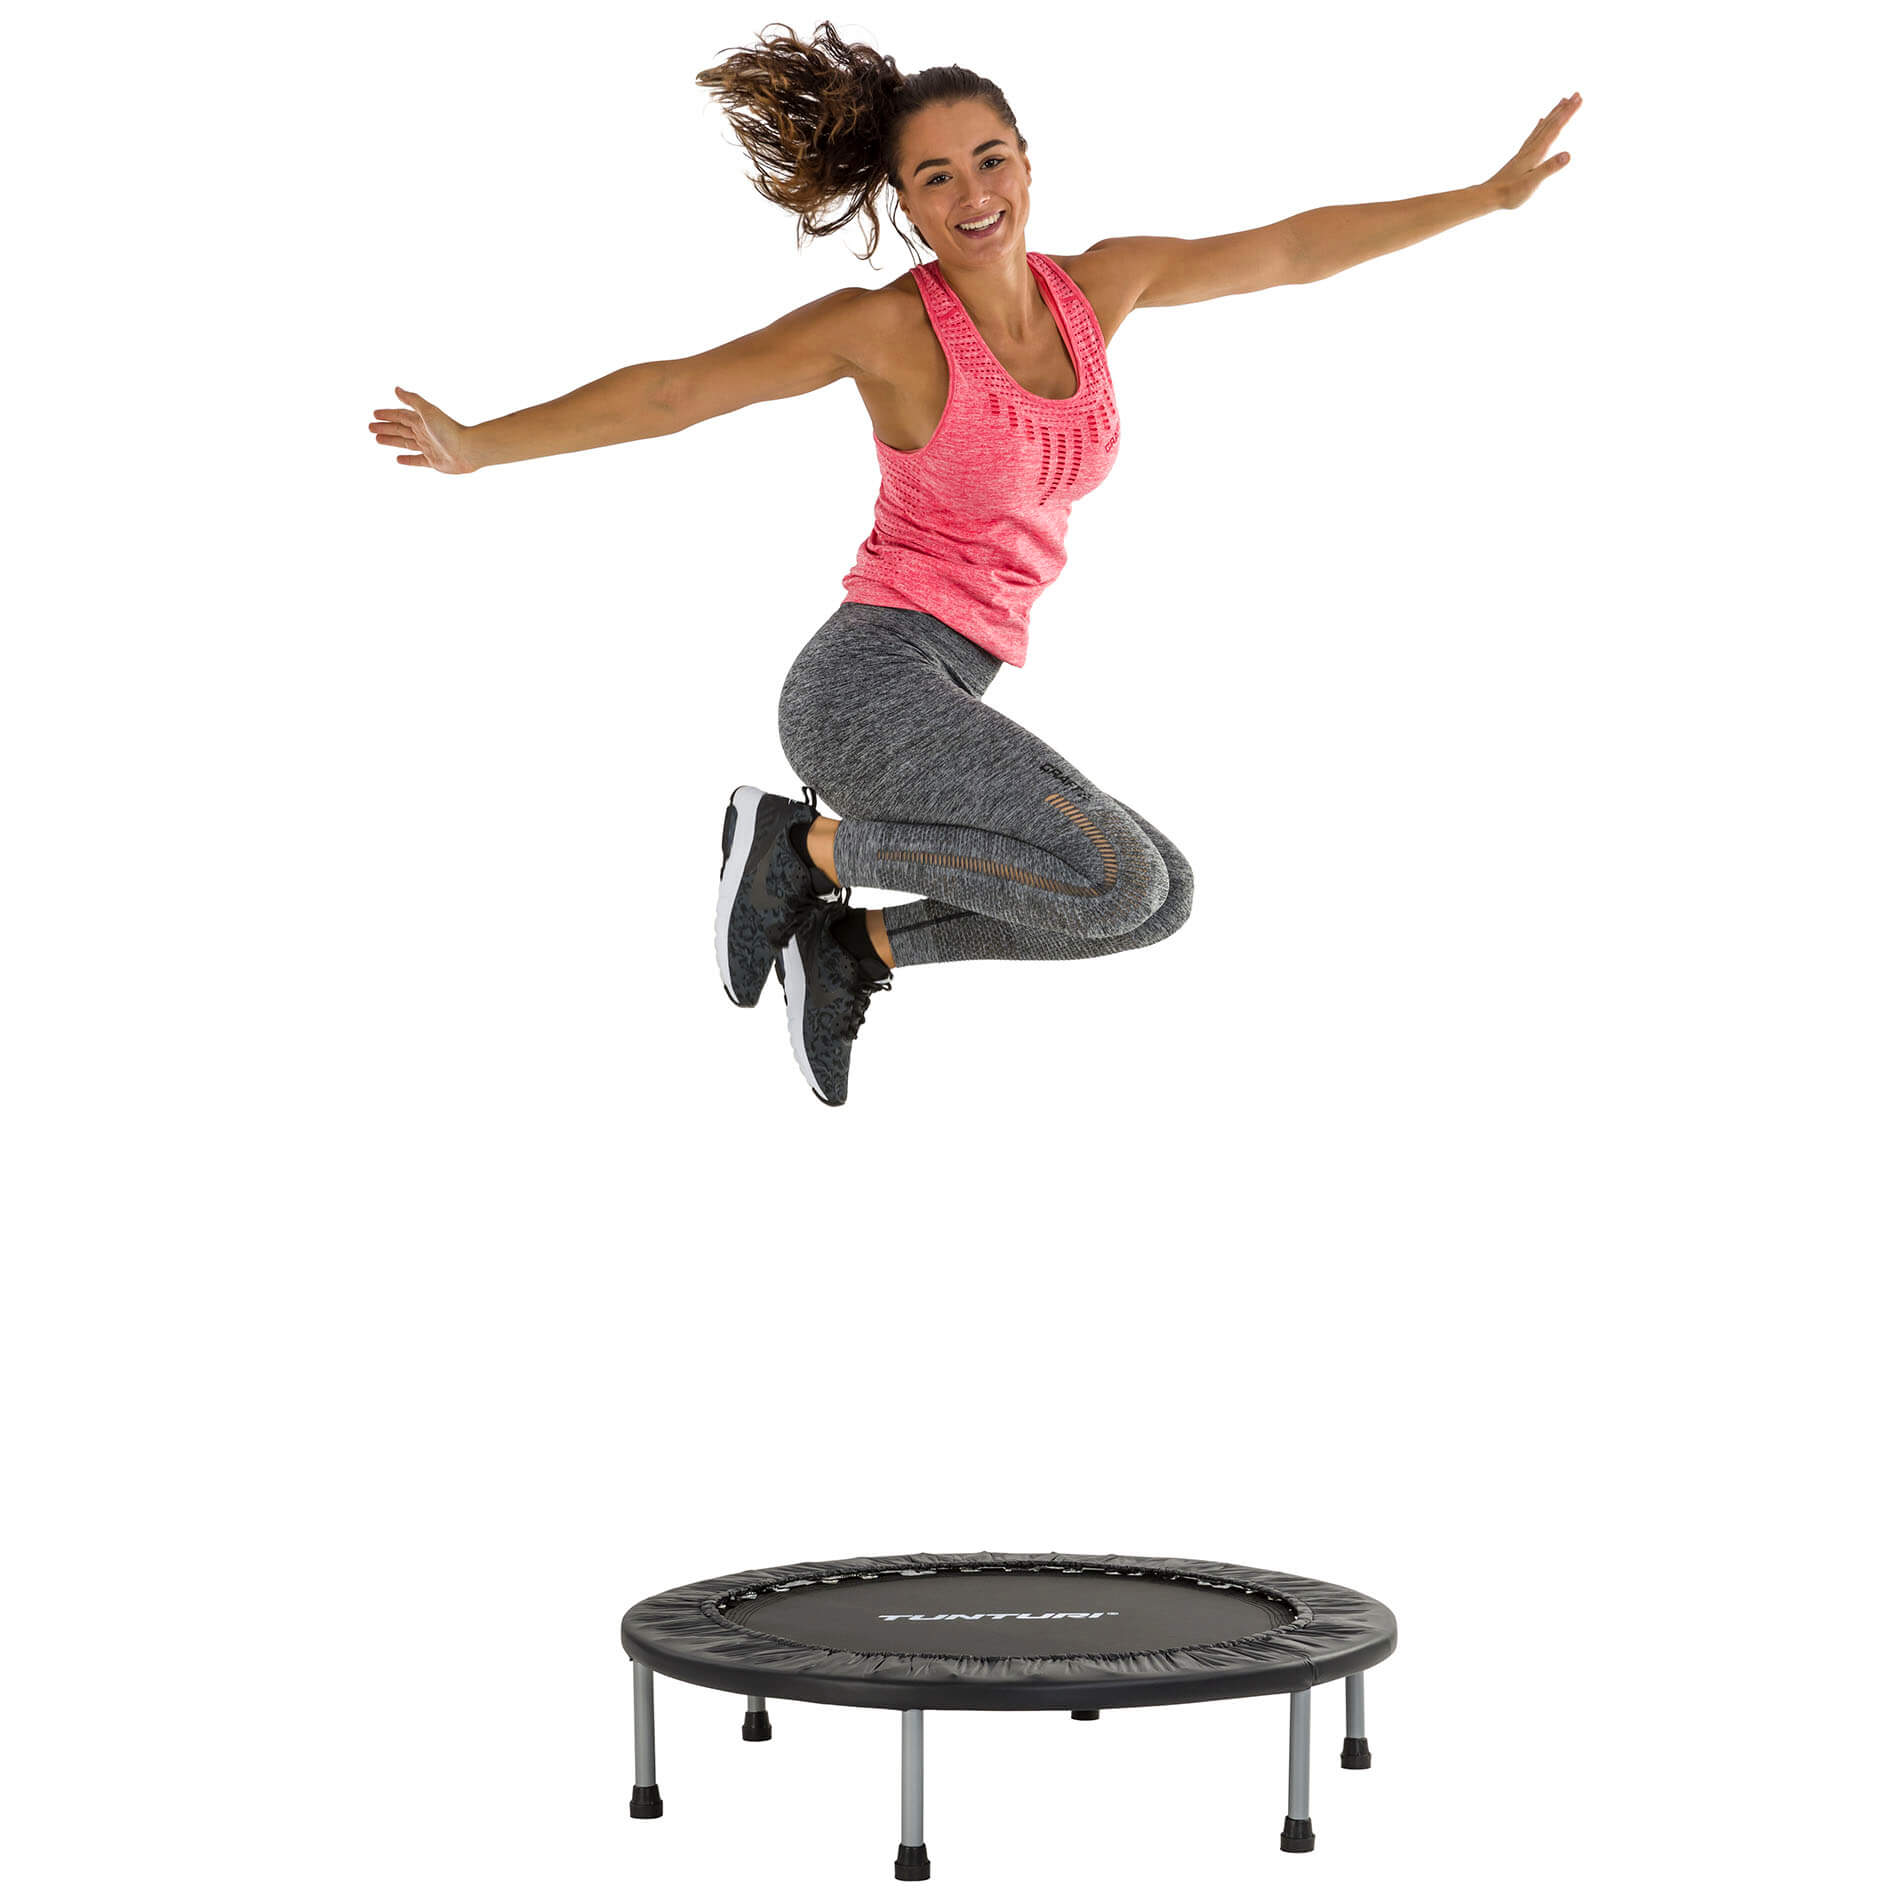 Funhop Fitness trampoline - Mini trampoline